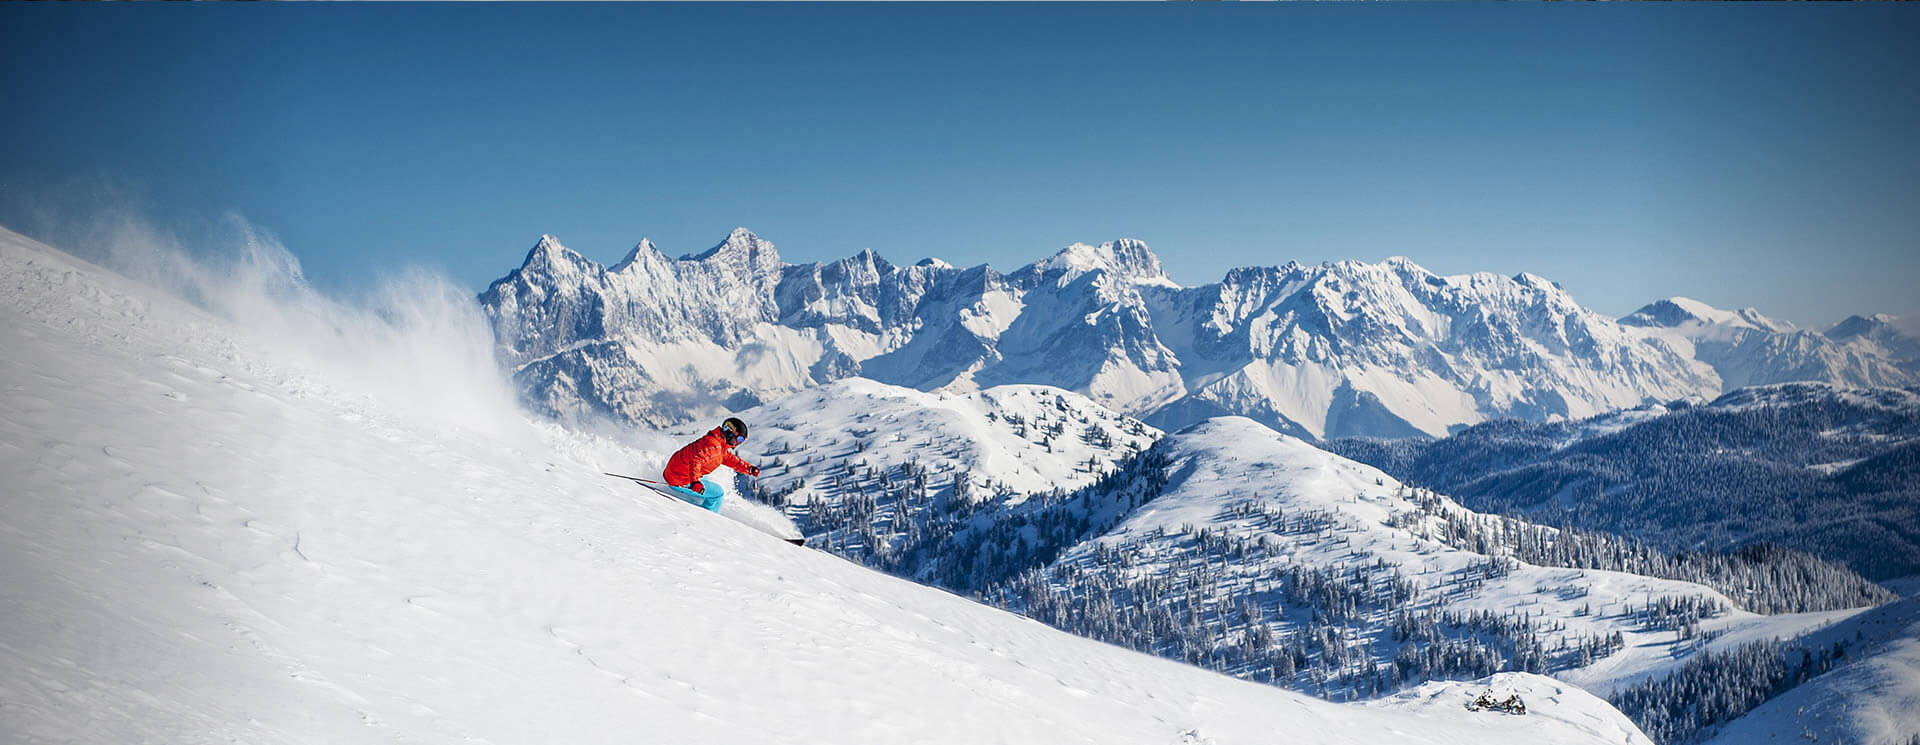 ski amad skiurlaub in zauchensee hotel salzburger hof. Black Bedroom Furniture Sets. Home Design Ideas